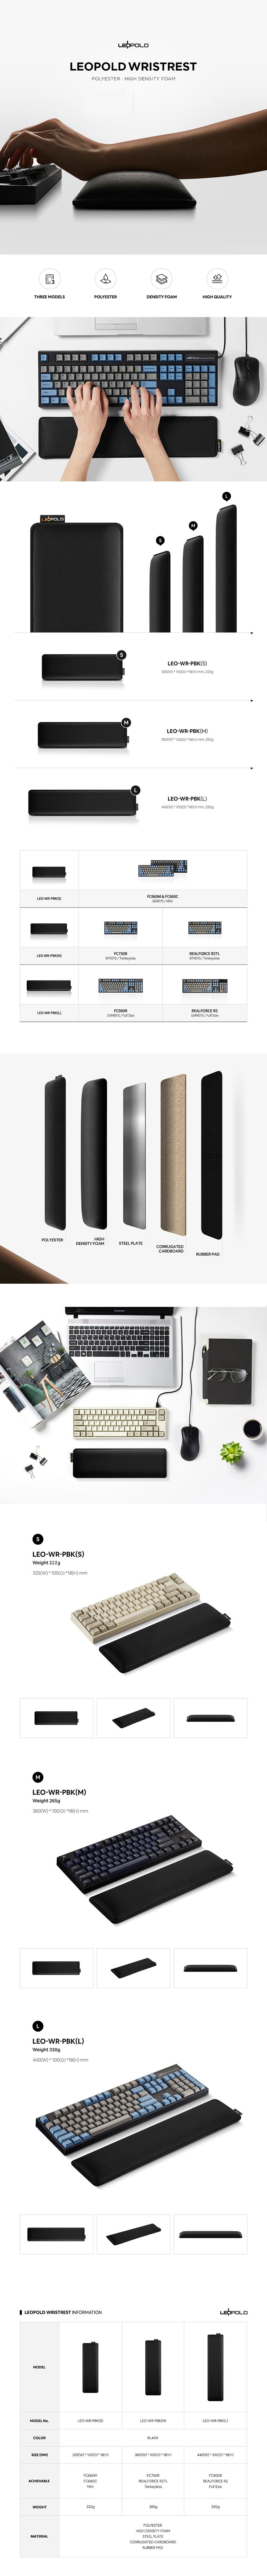 Leopold Ergonomic Keyboard Wrist Rest - Overview 1